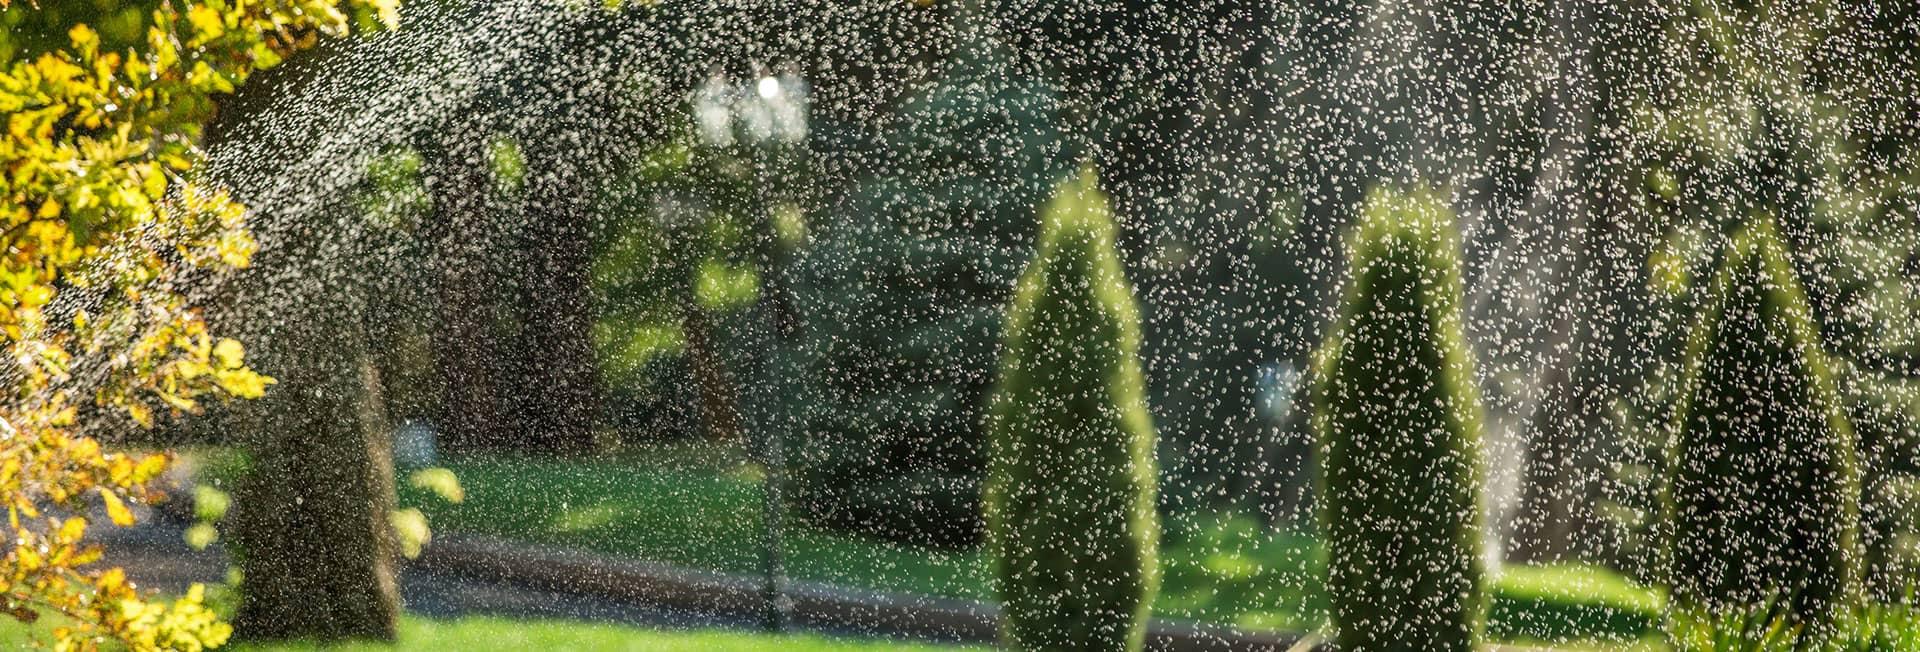 residential-irrigation-minnesota.jpg